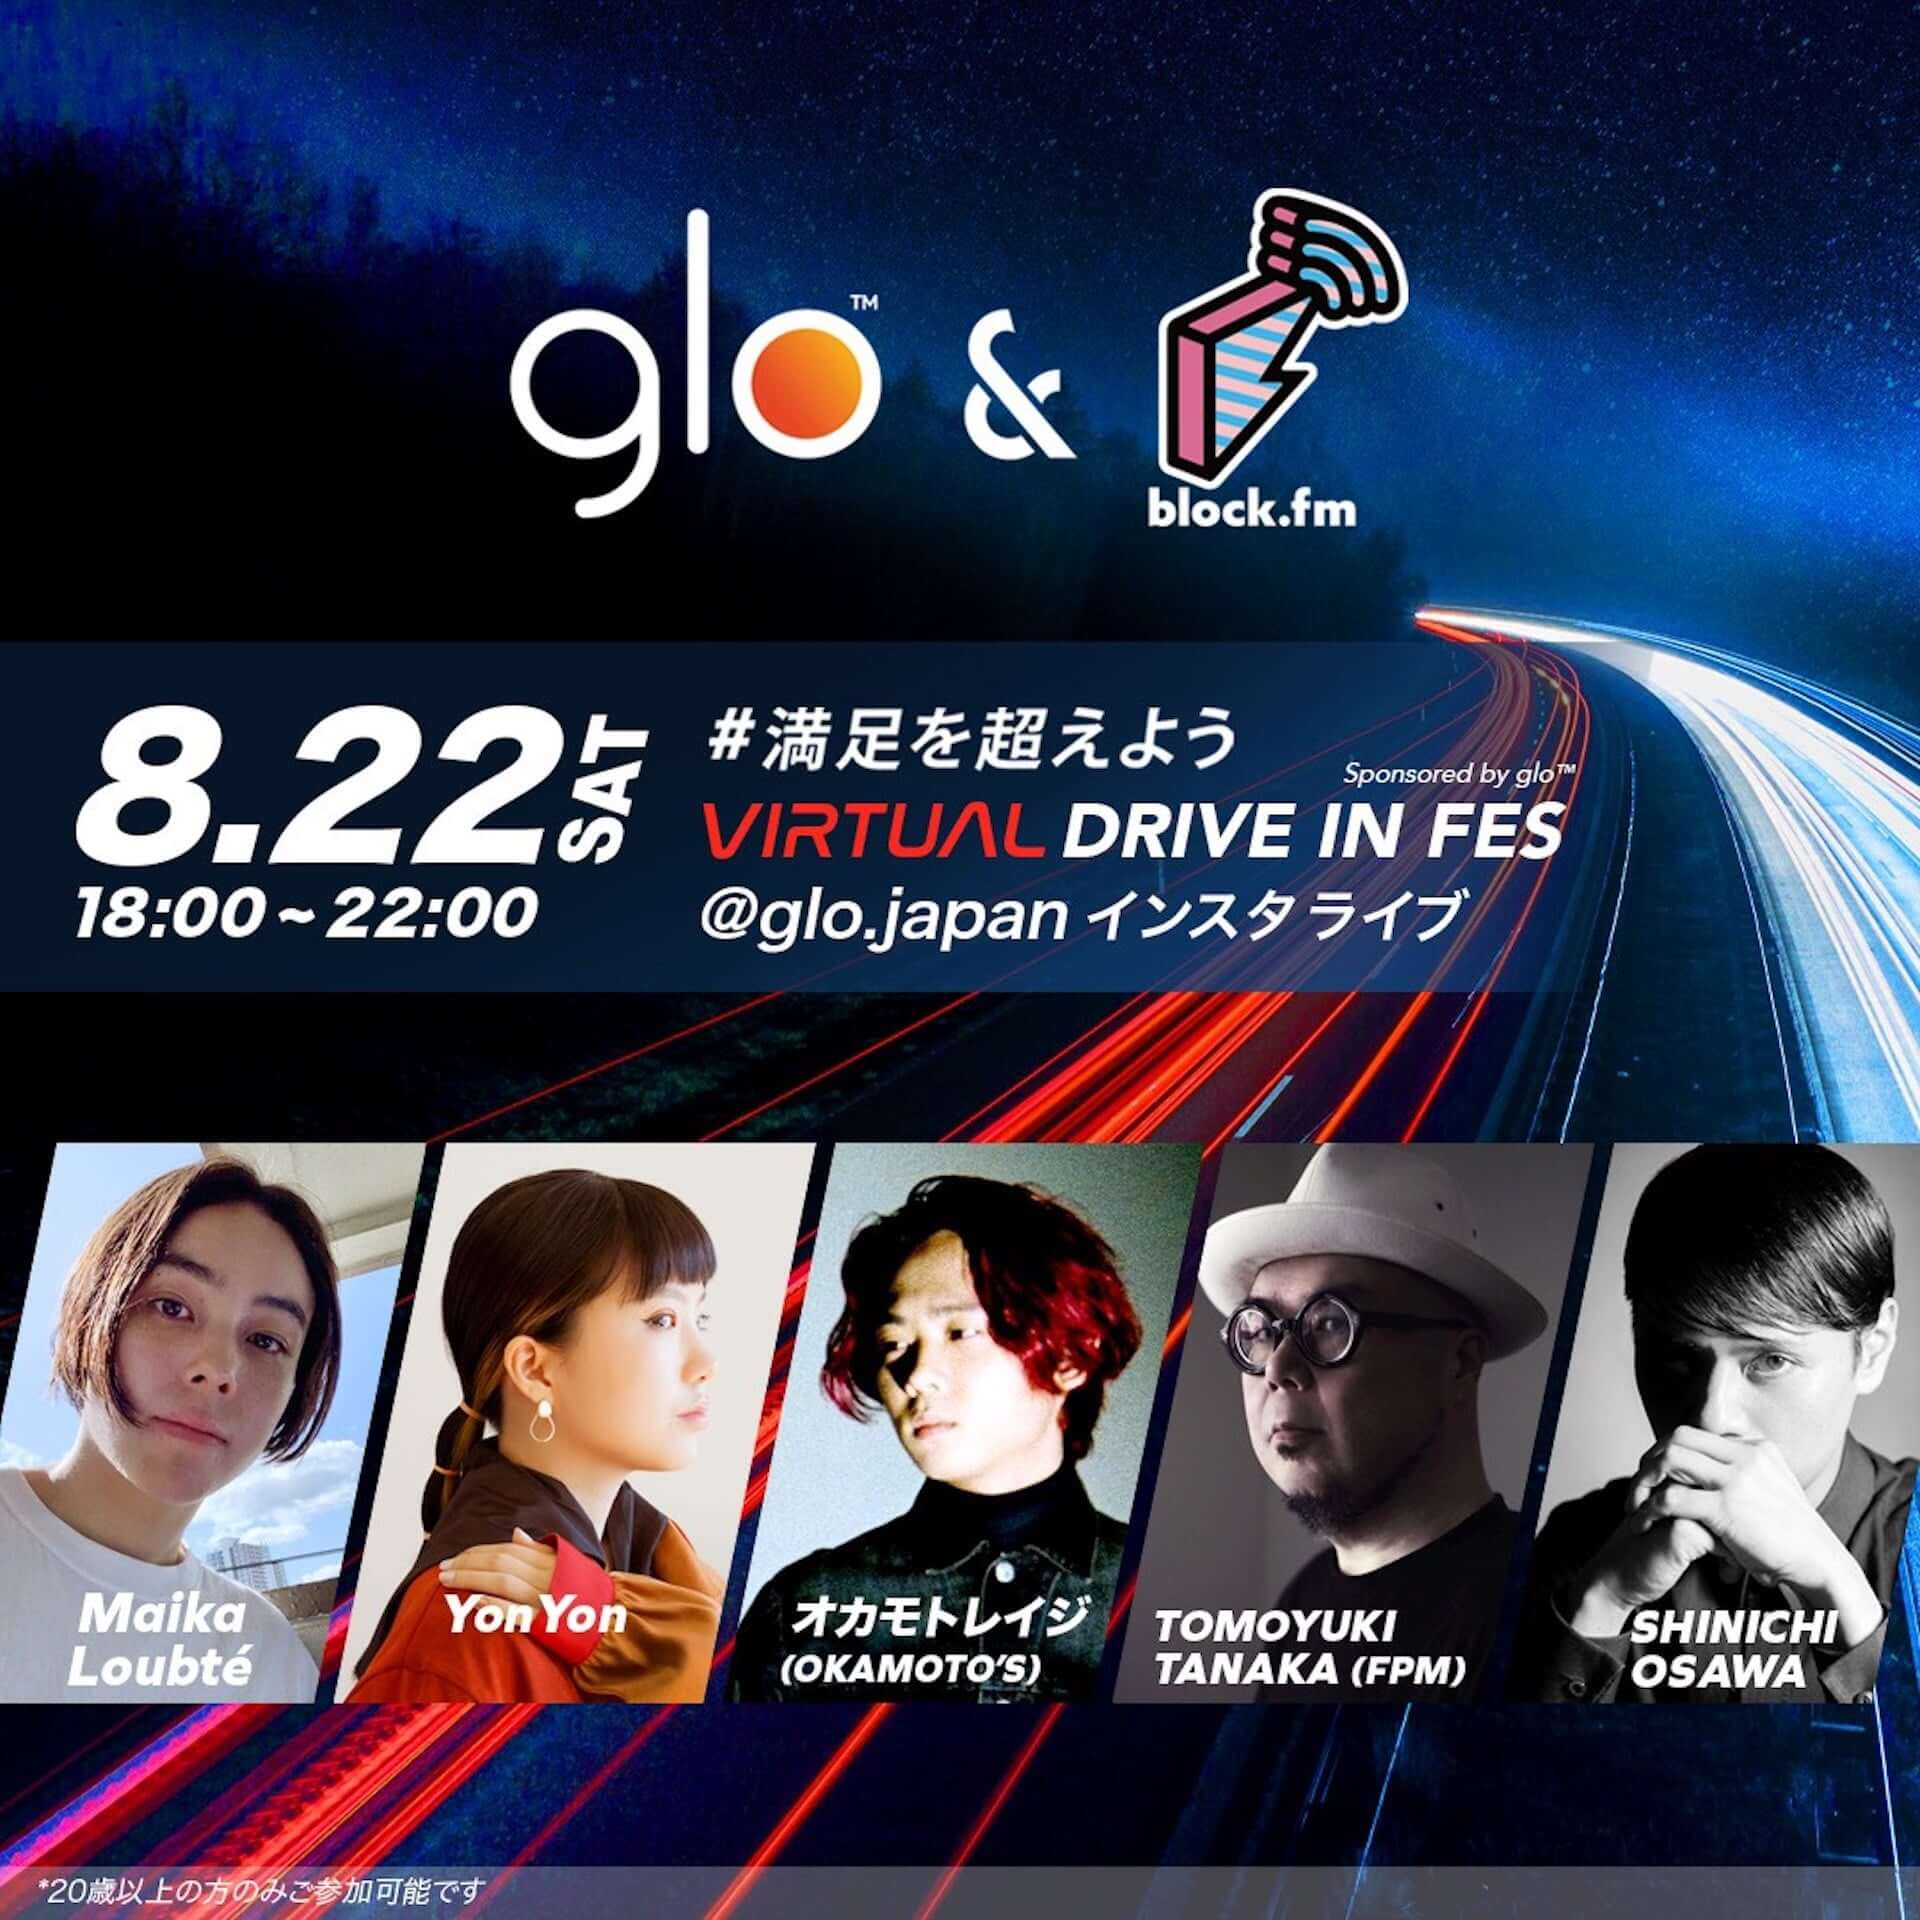 <glo™ × block.fm LIVE>プロジェクトがドライブインフェスを配信決定!オカモトレイジ、SHINICHI OSAWA、Tomoyuki Tanakaも出演 music200817_glo-blockfm_10-1920x1920